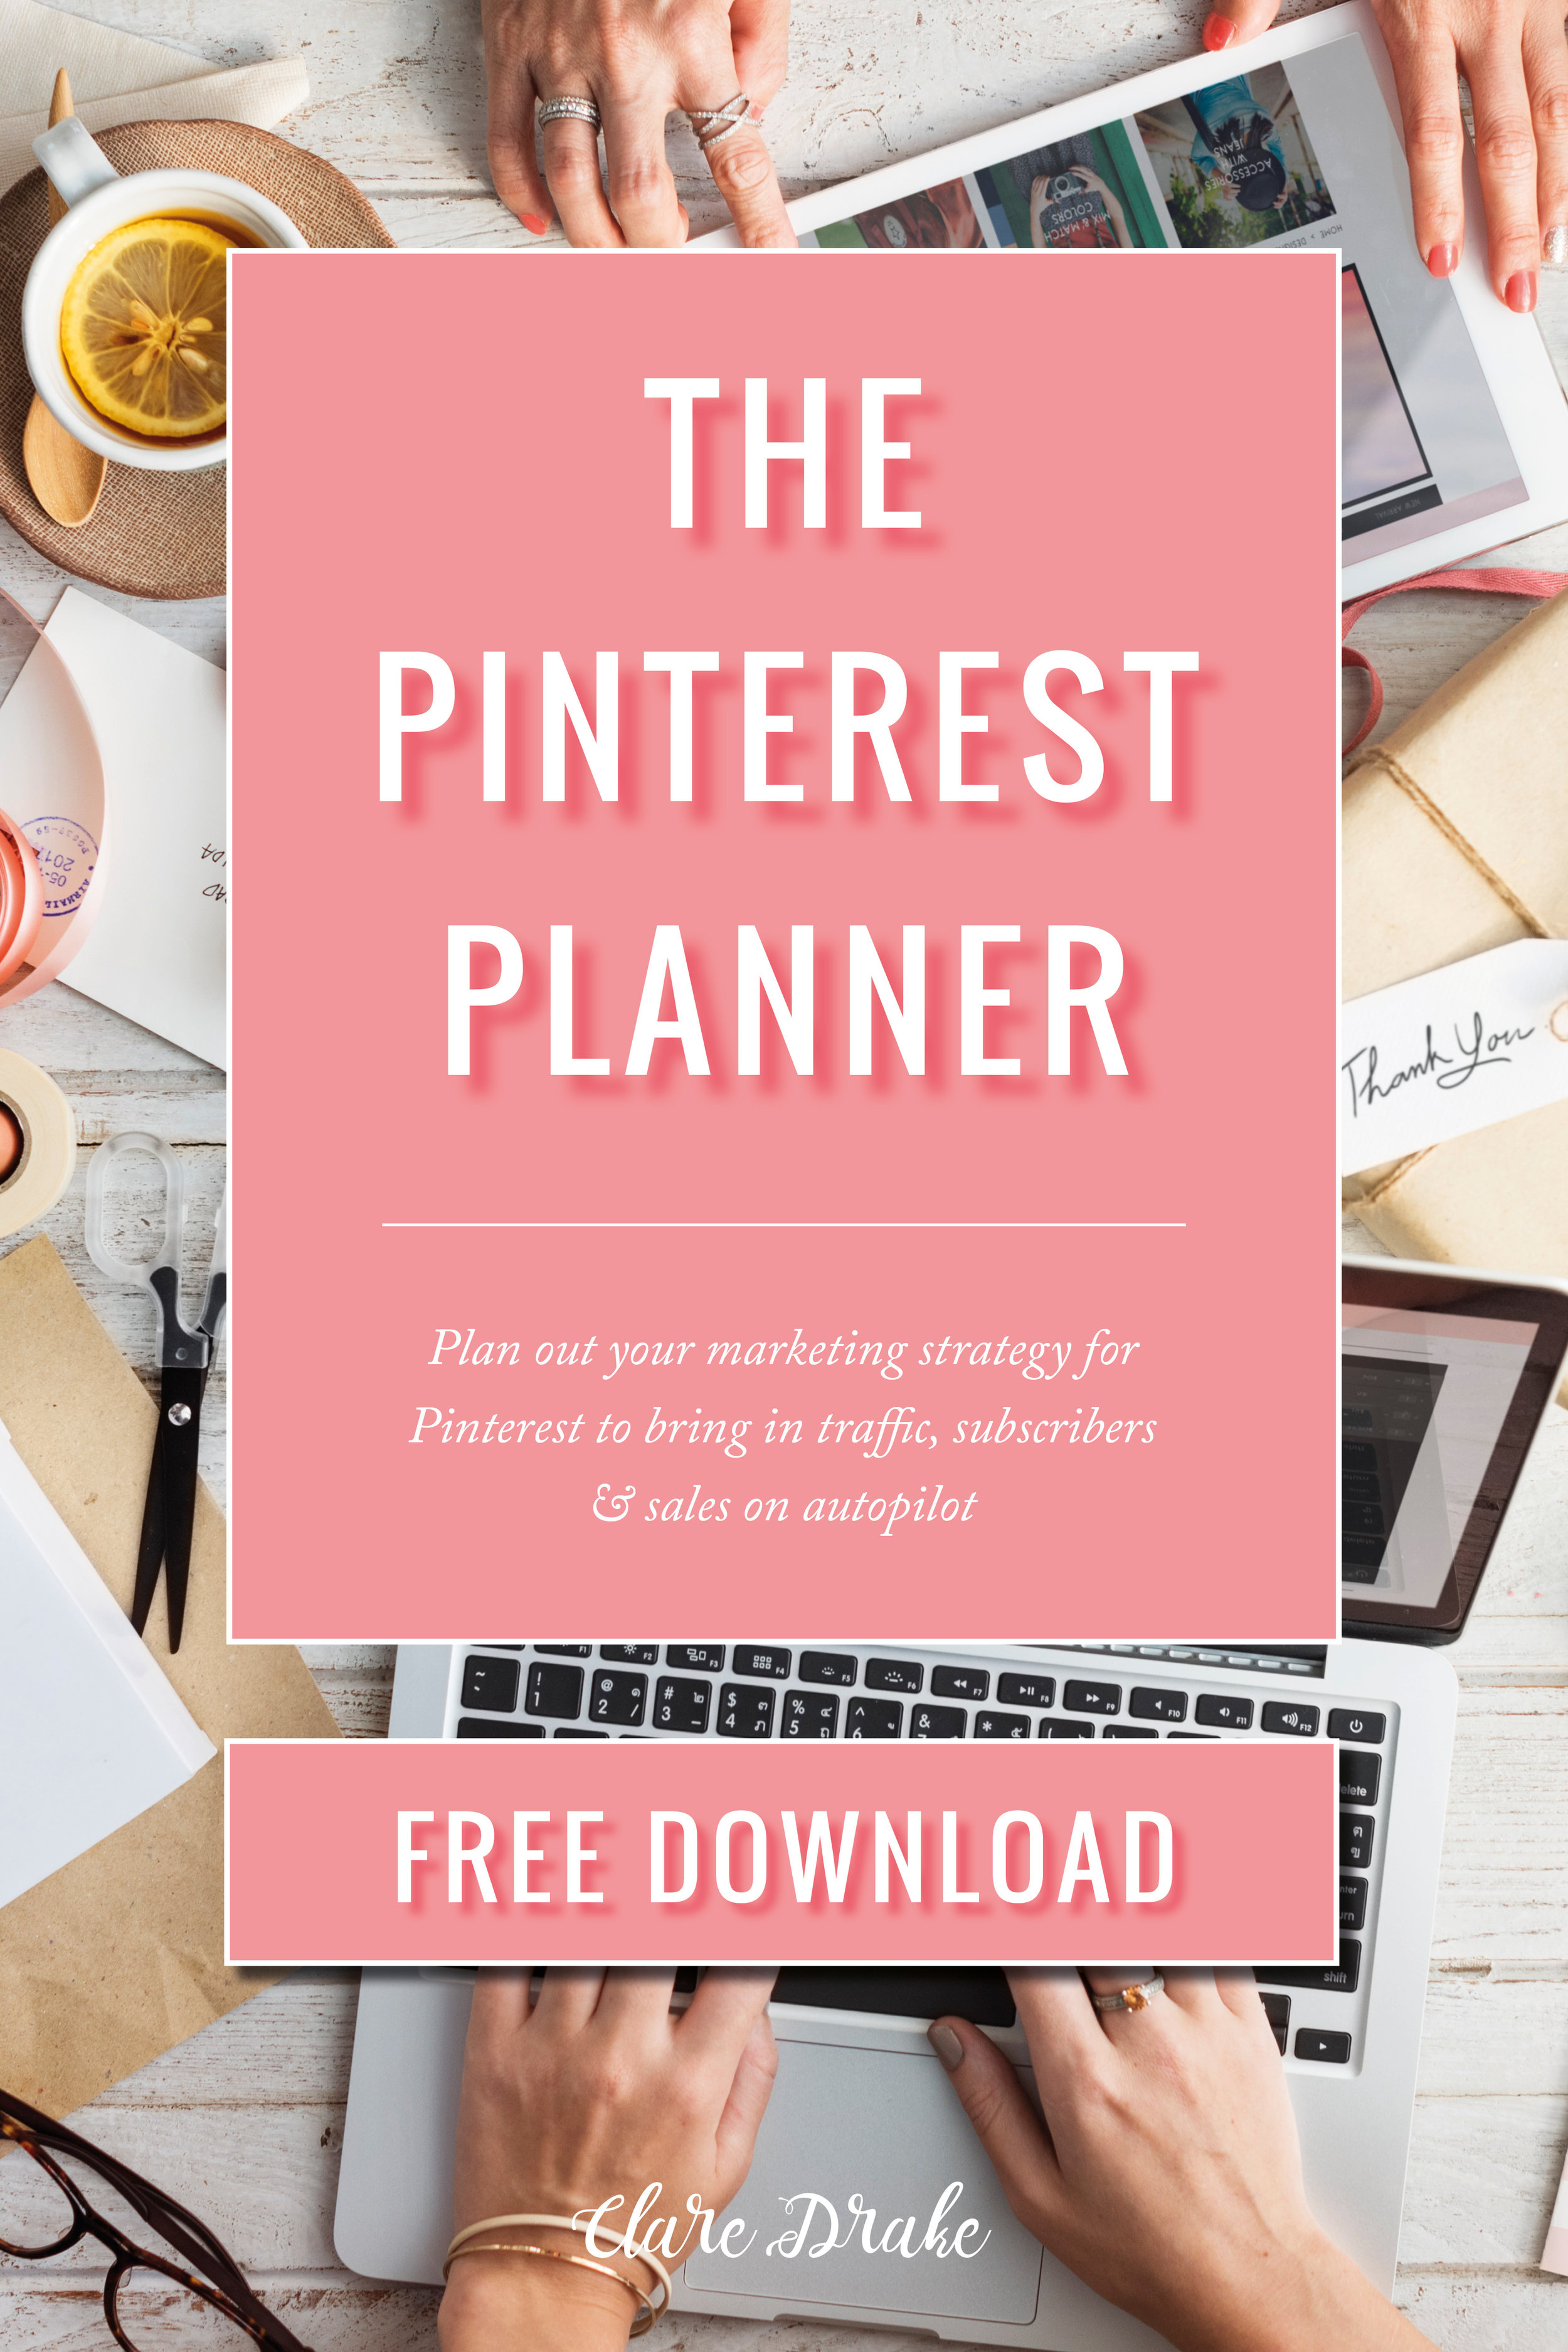 Pinterest Planner [FREE DOWNLOAD] via @claredrake1